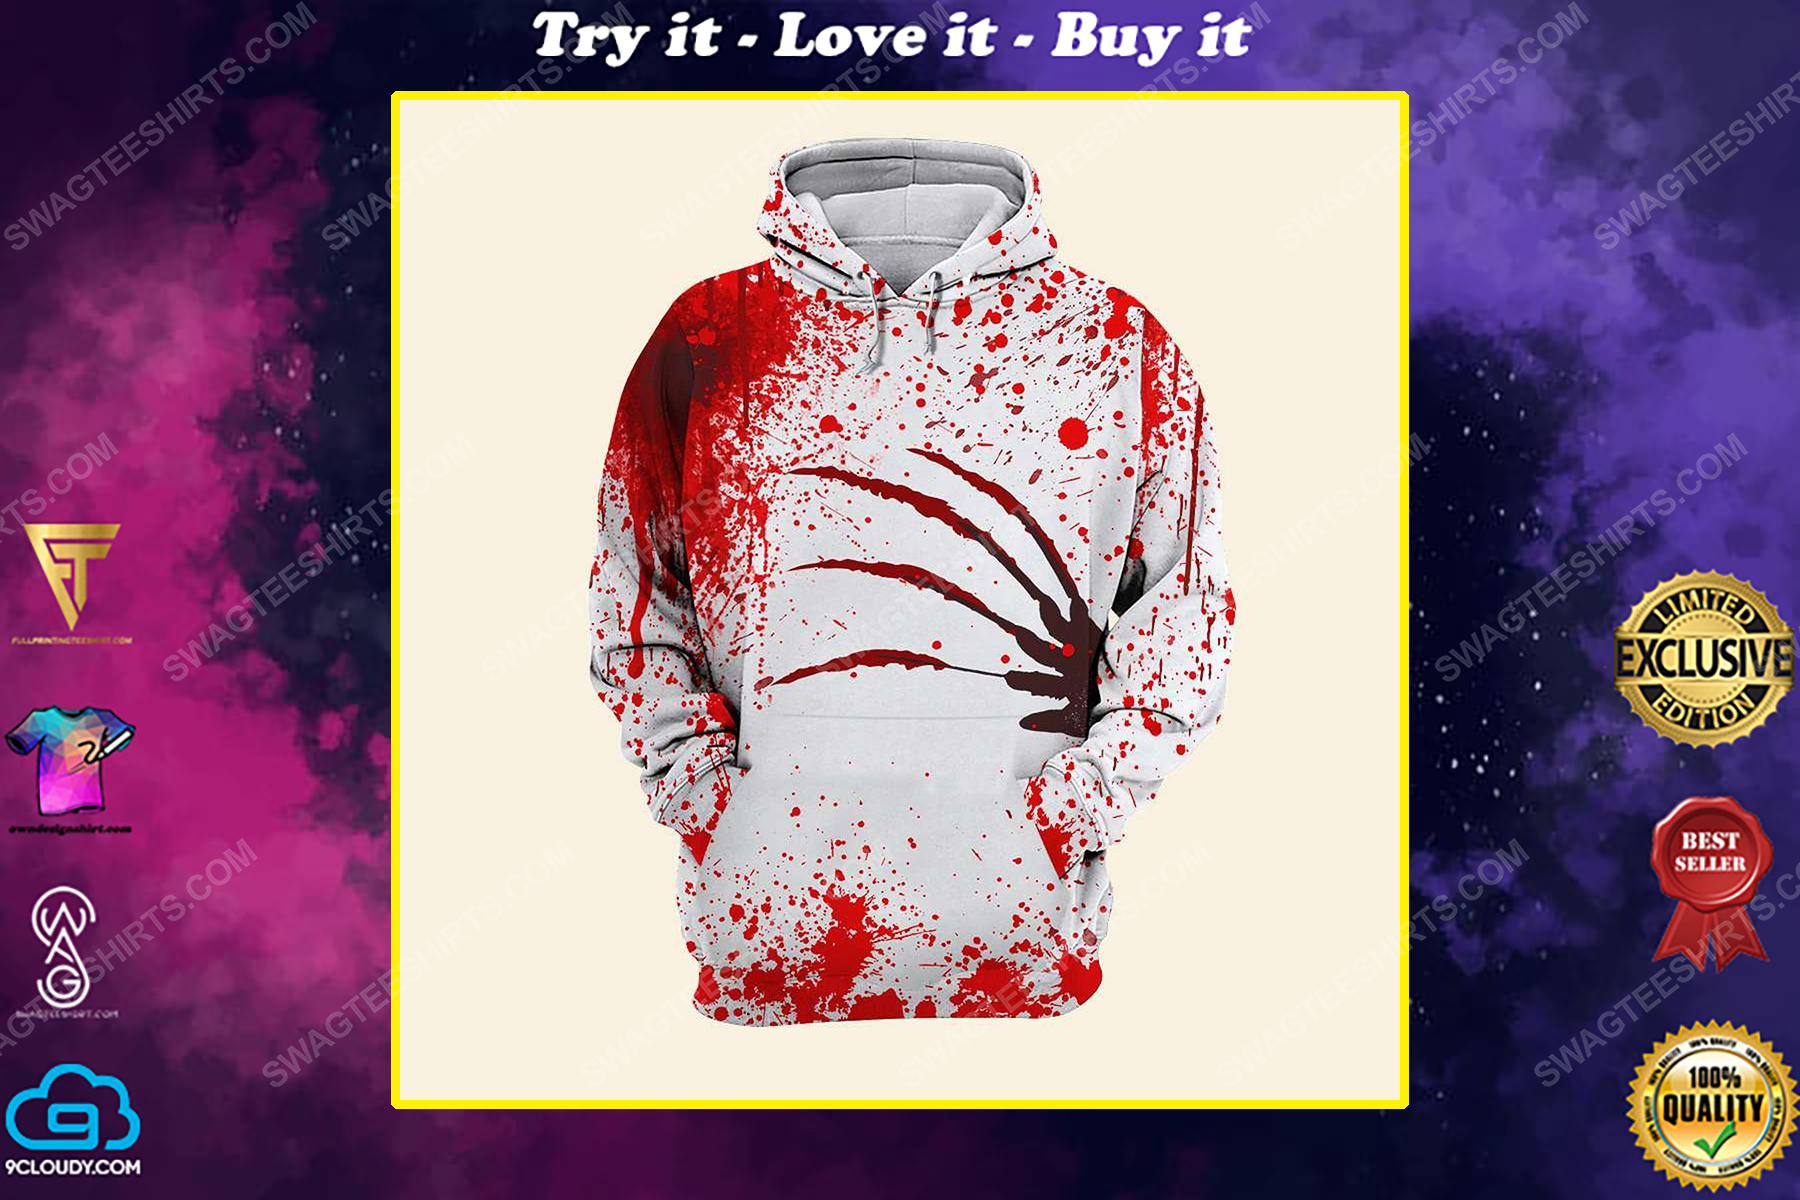 Halloween blood horror movies lover freddy's nightmares shirt